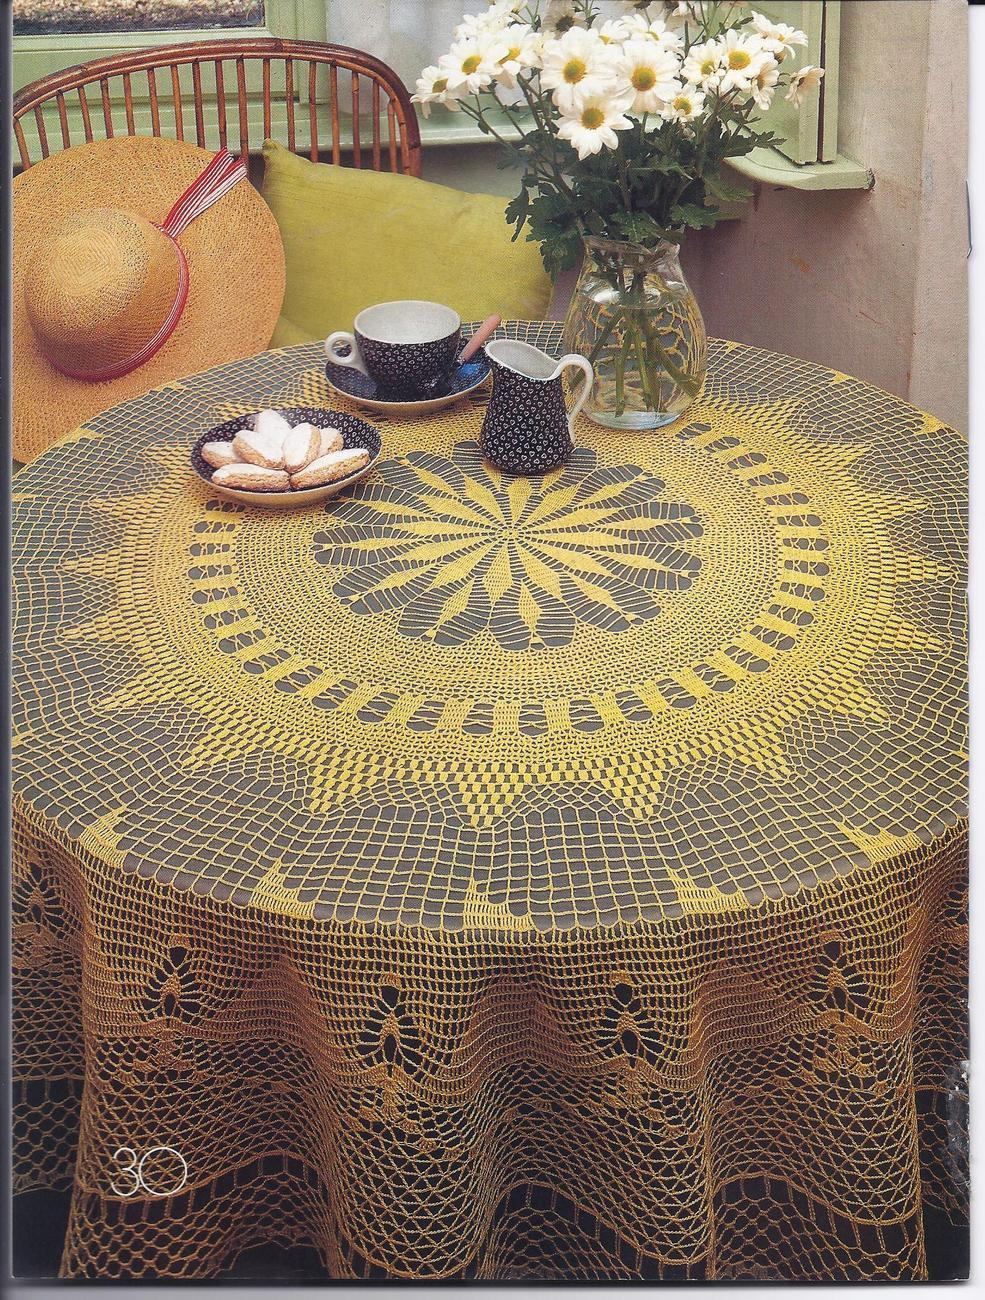 Decorative Crochet Pattern Magazine #20~~30 Patterns